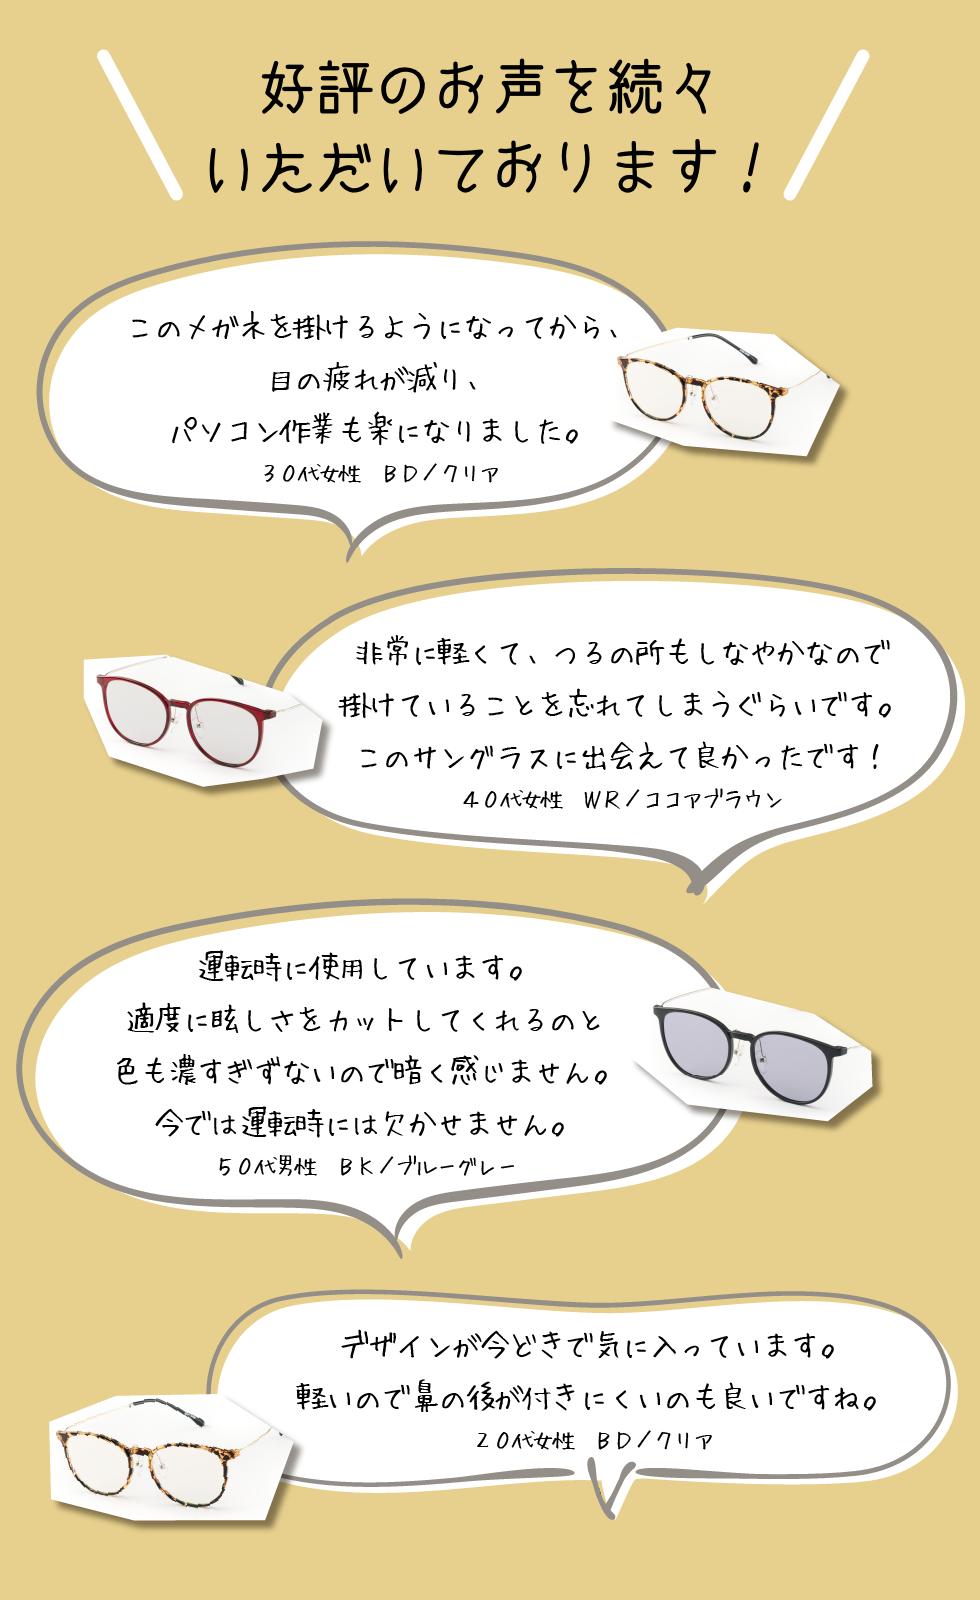 東海光学口コミ.png